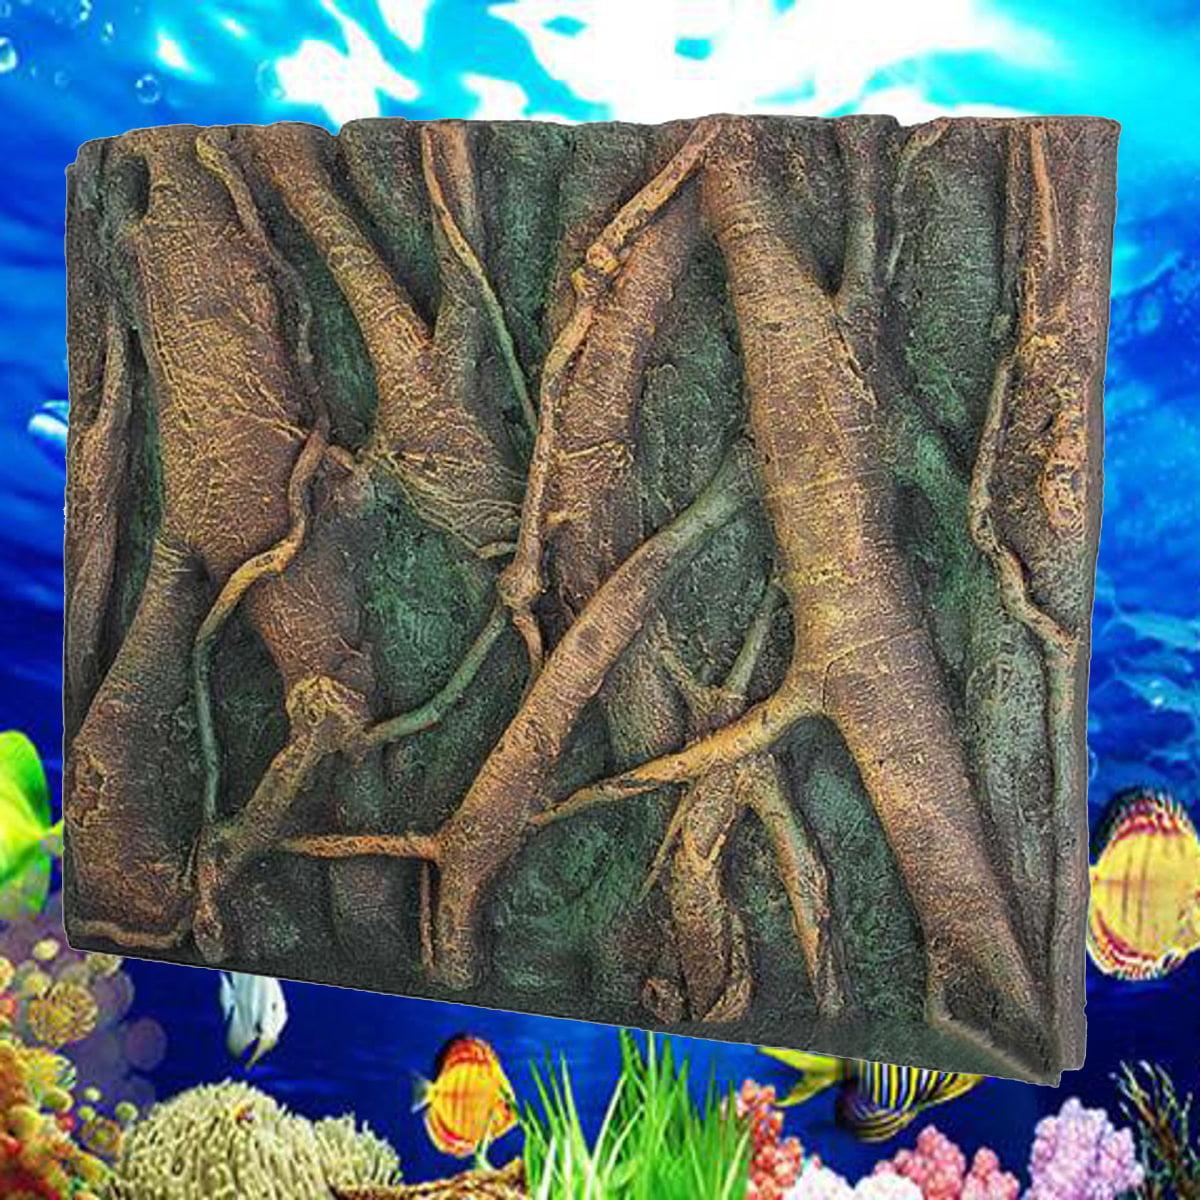 3D PU Tree Root Reptile Aquarium Background Backdrop Reptile Board Fish Tank Decoration by Moaere